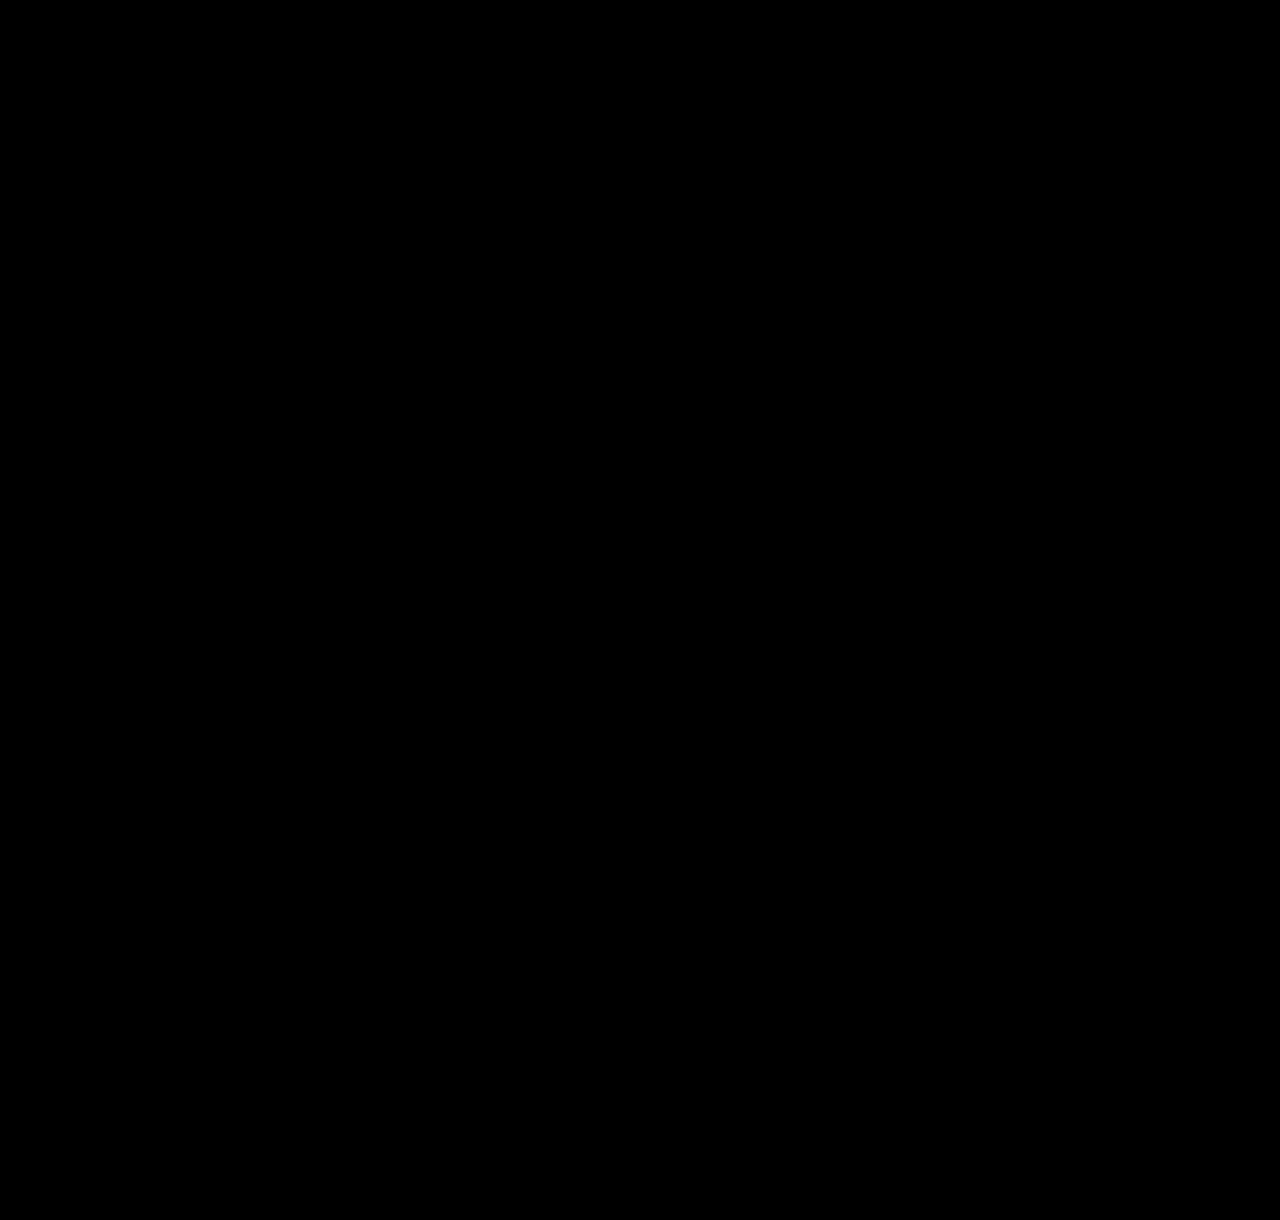 Extension ossature bois à Bischwiller 67240 : Devis et tarifs